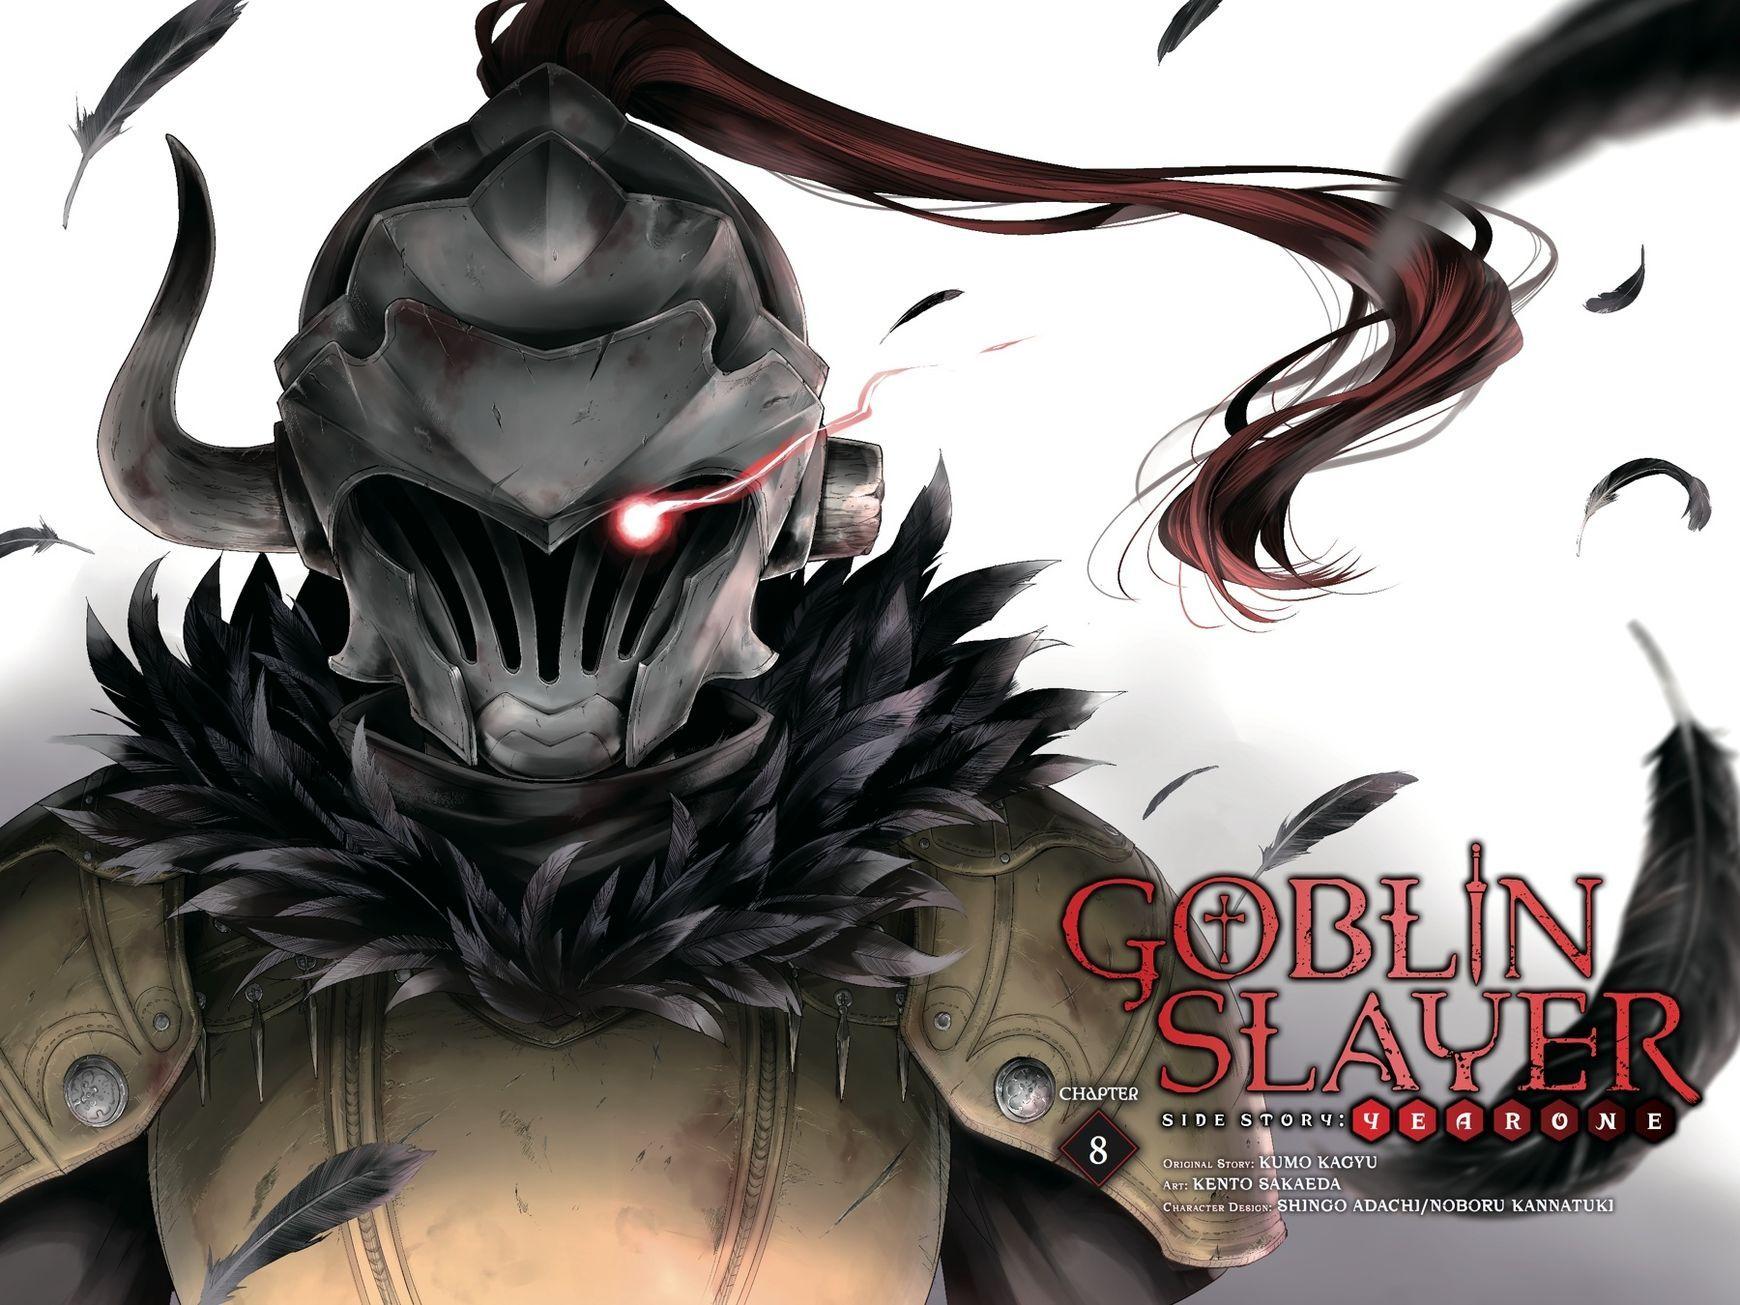 Goblin Slayer Side Story Year One ch.008 Slayer, Goblin